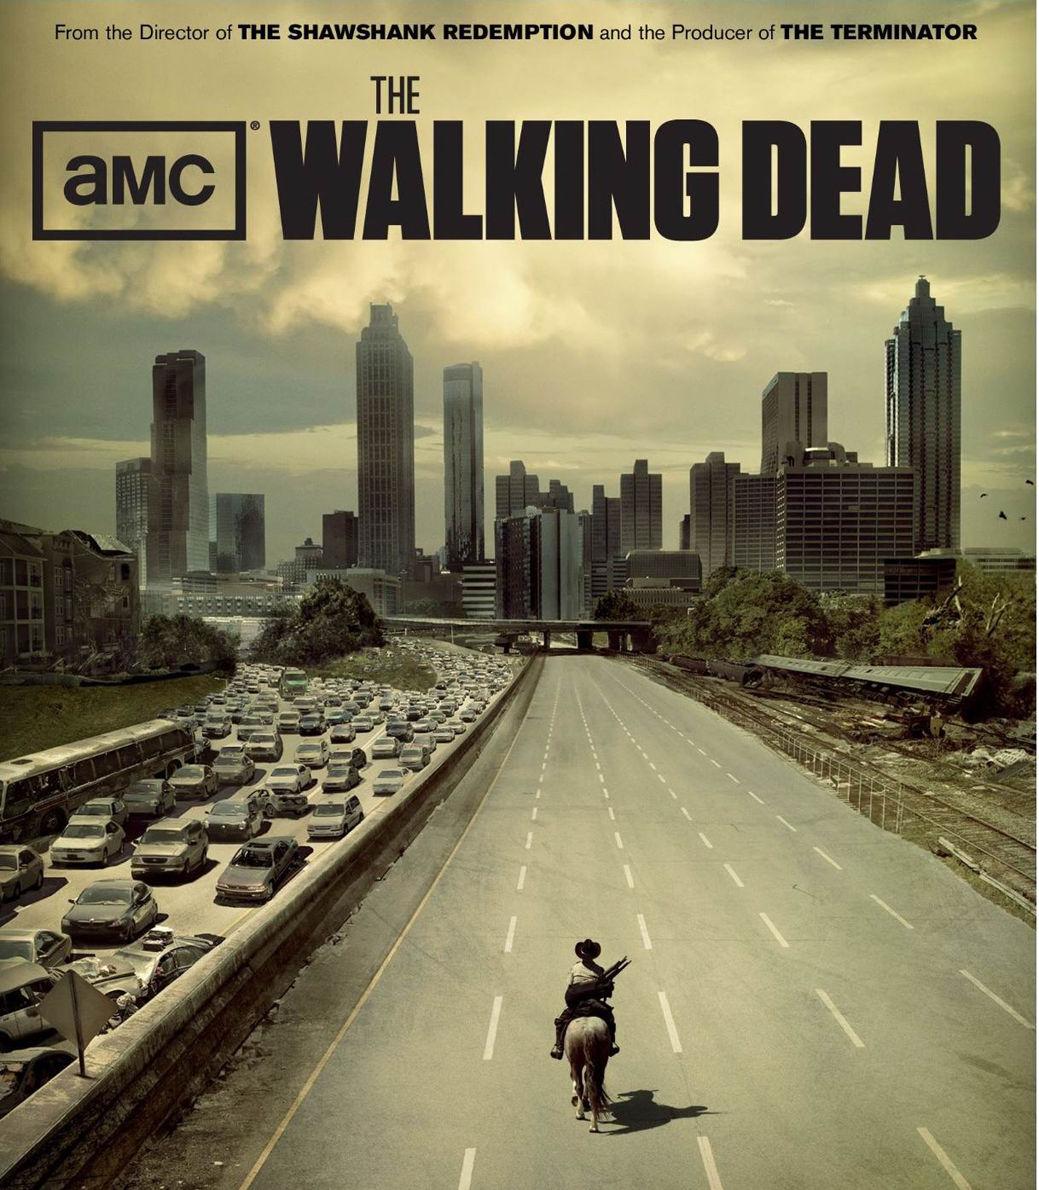 "The Walking Dead <font><b>1</b></font> 2 <font><b>3</b></font> <font><b>4</b></font> TV Zombie Fabric Poster <font><b>16</b></font>"" <font><b>x</b></font> 13"" Decor <font><b>26</b></font>"